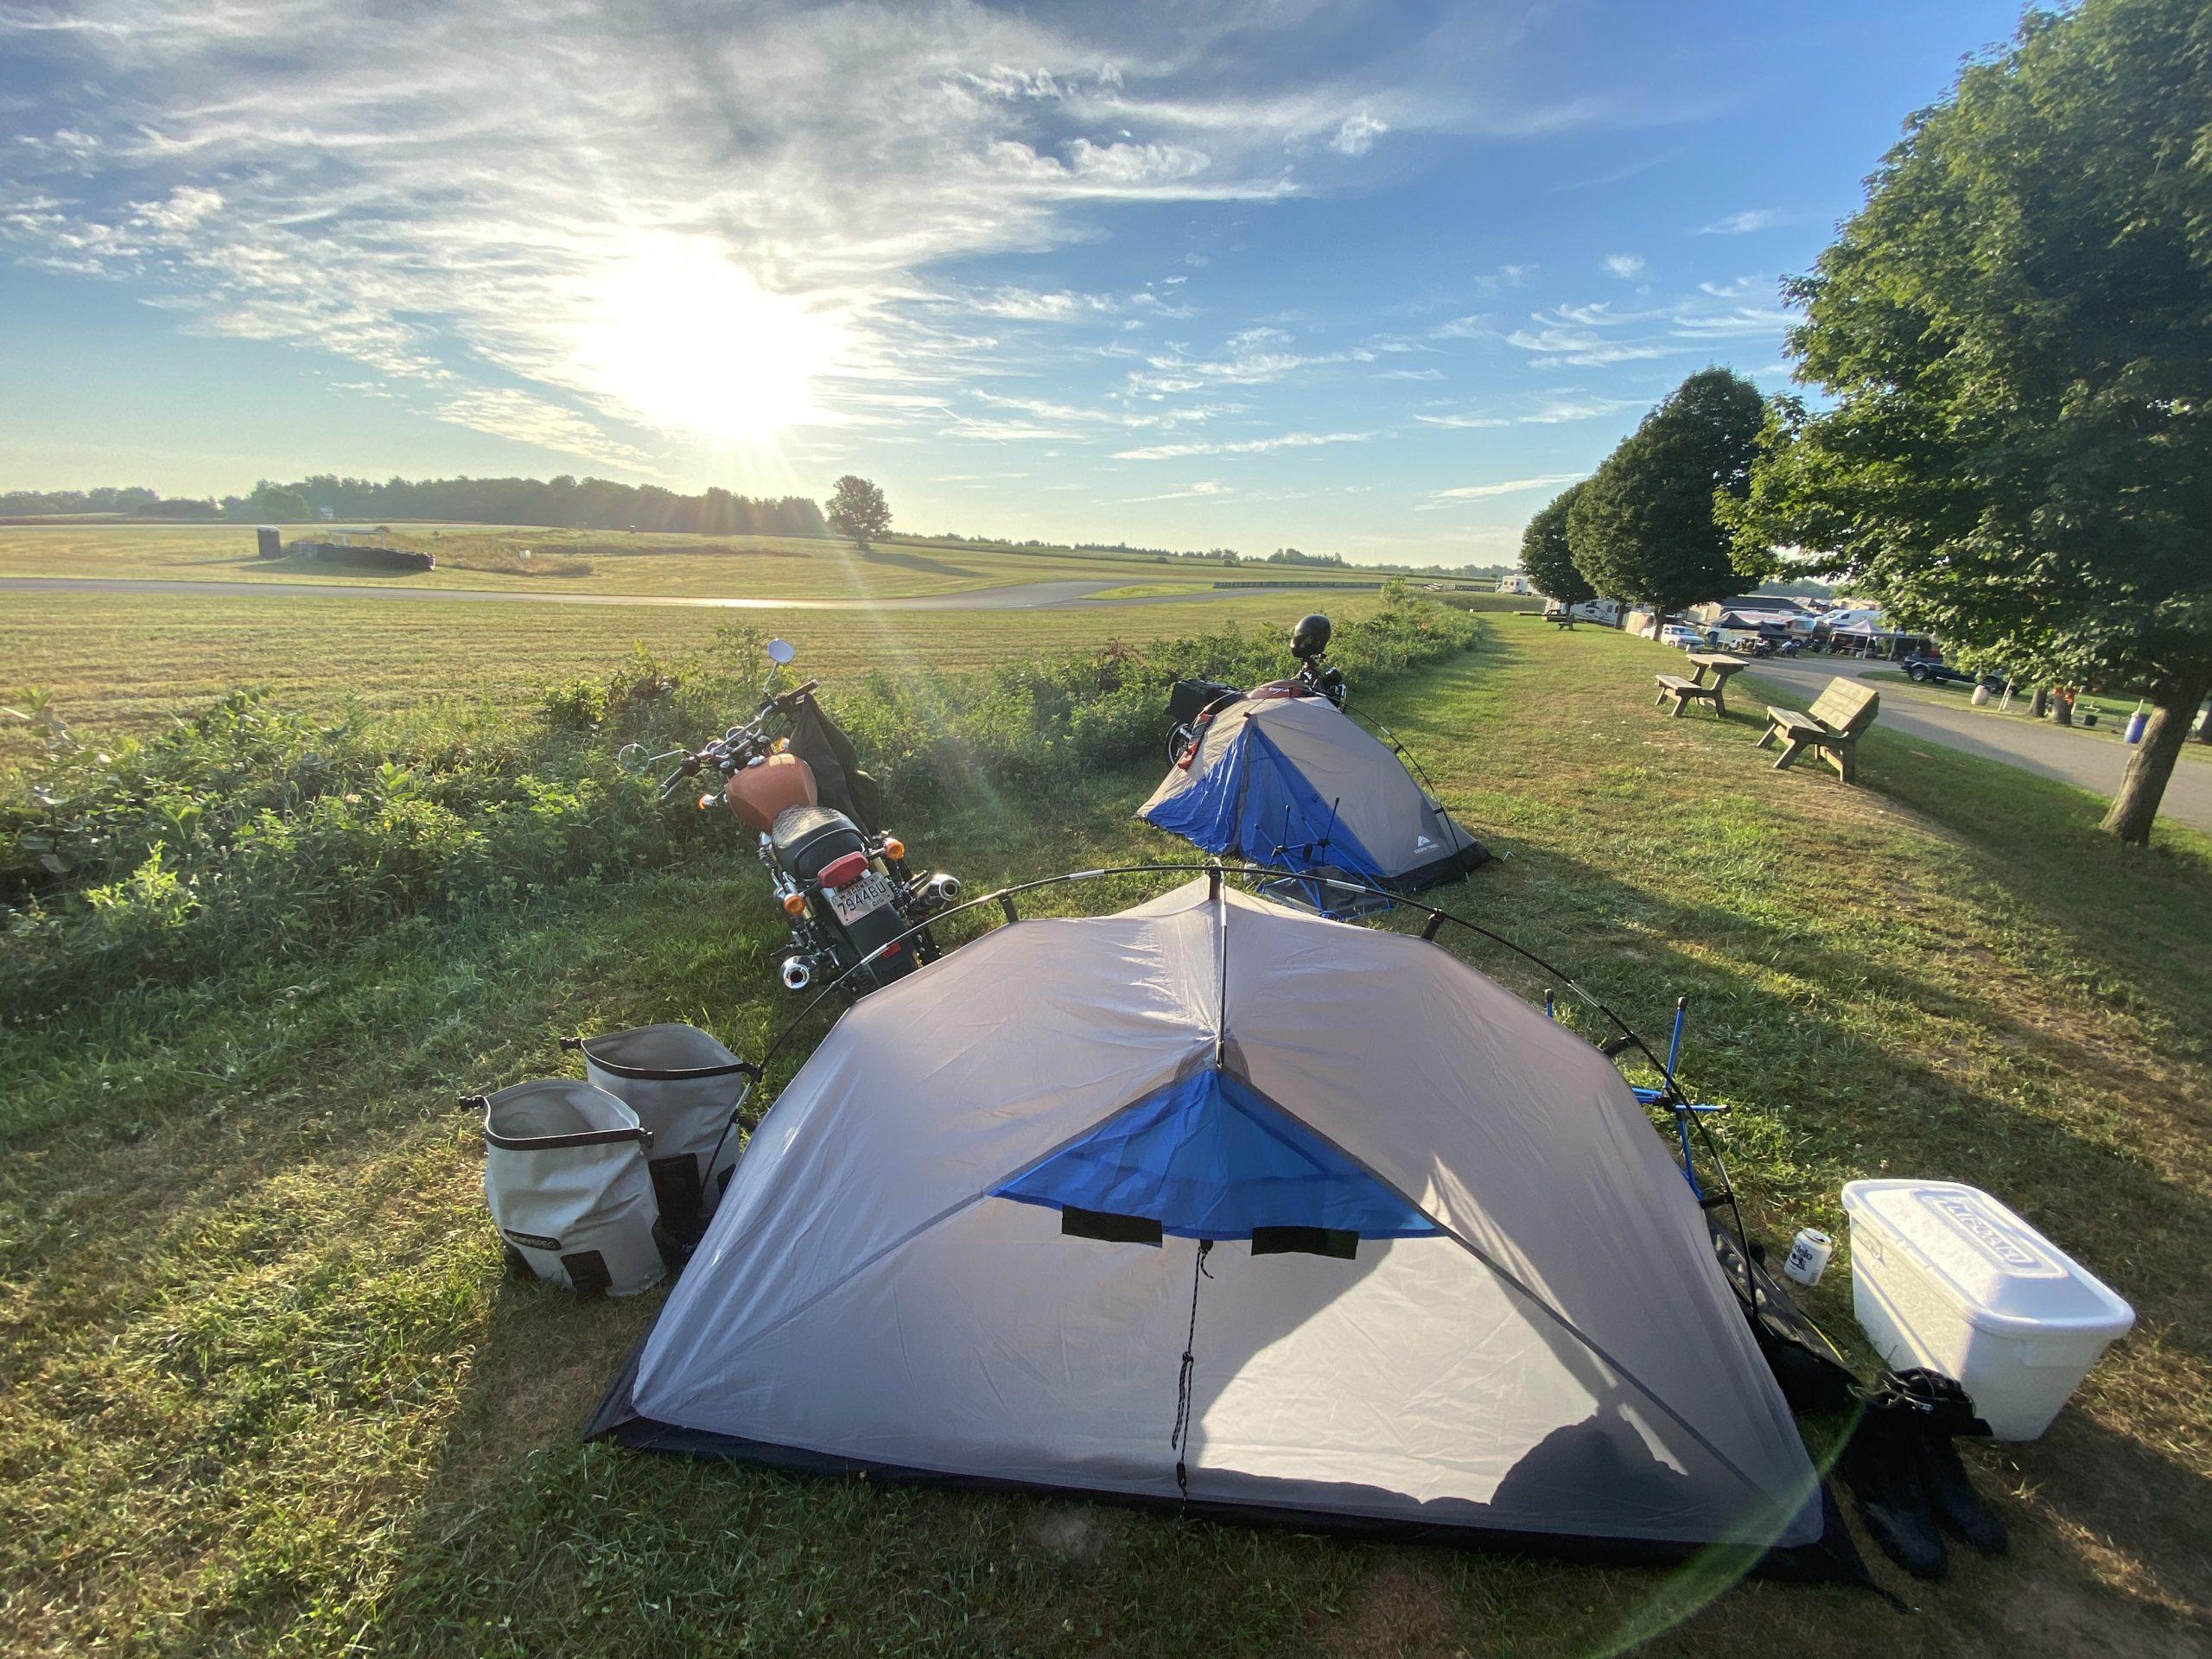 gingerman moto trip campsite